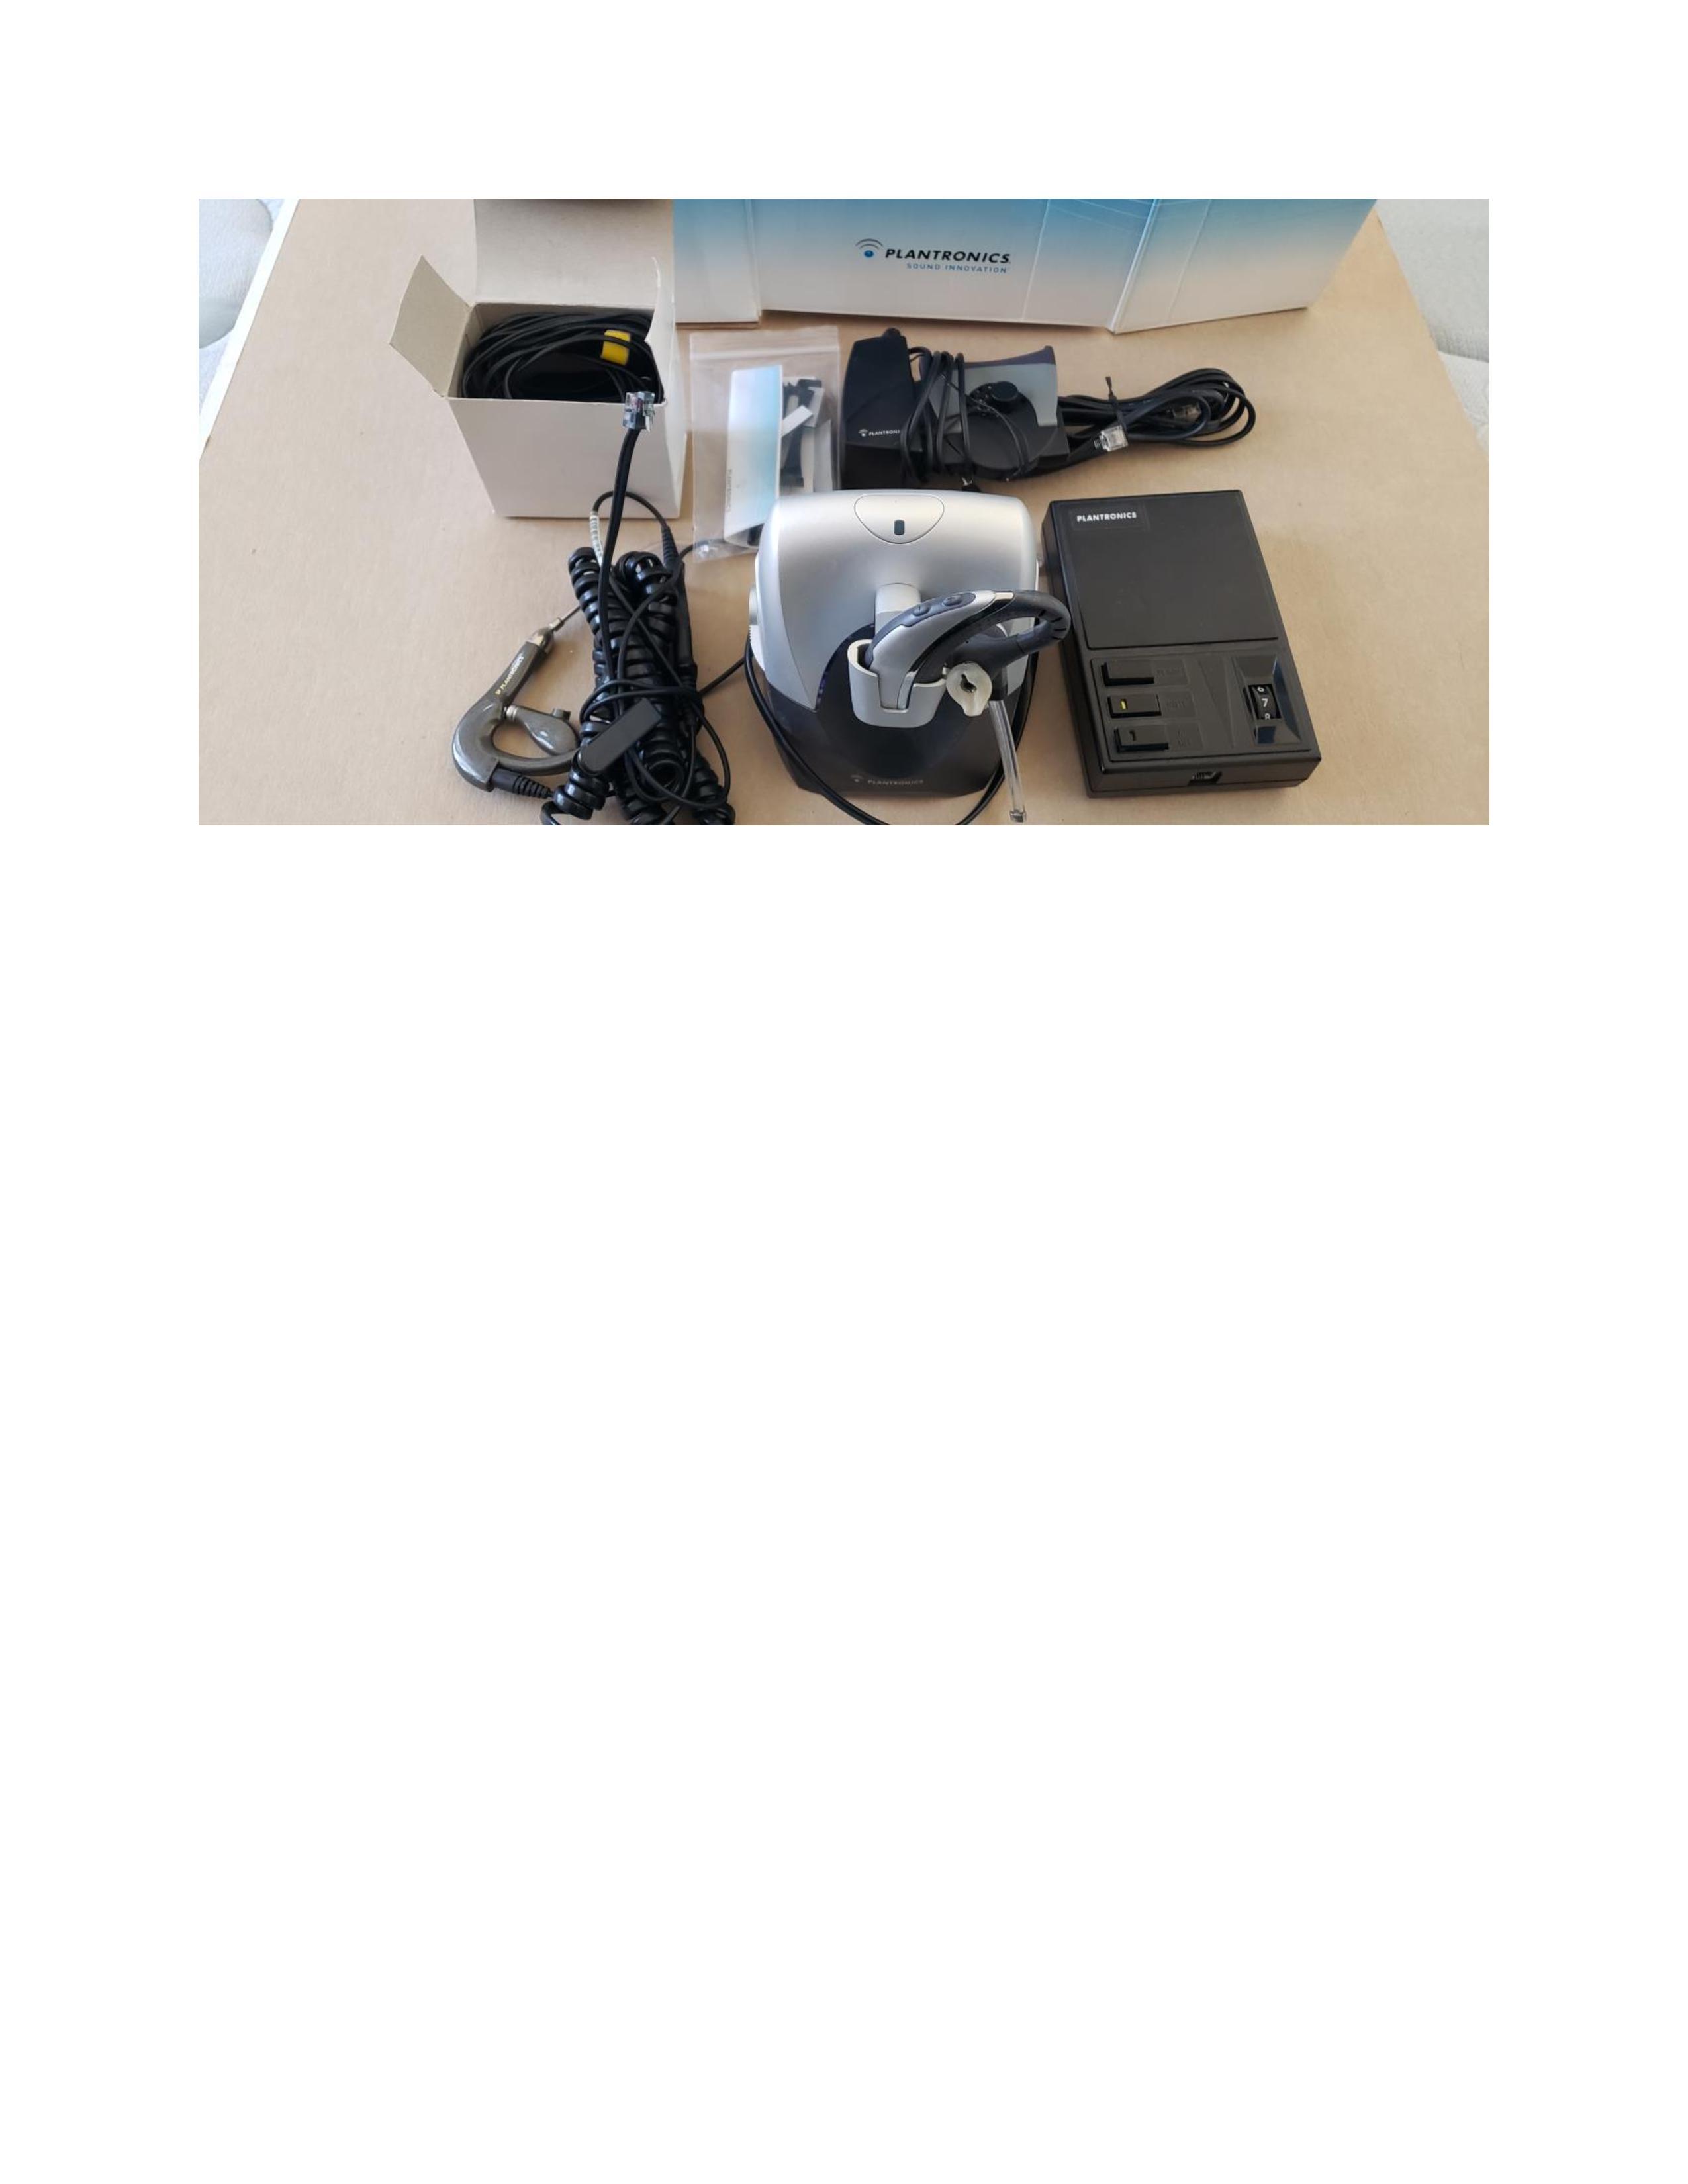 Plantronics Headset(s) & Accessories